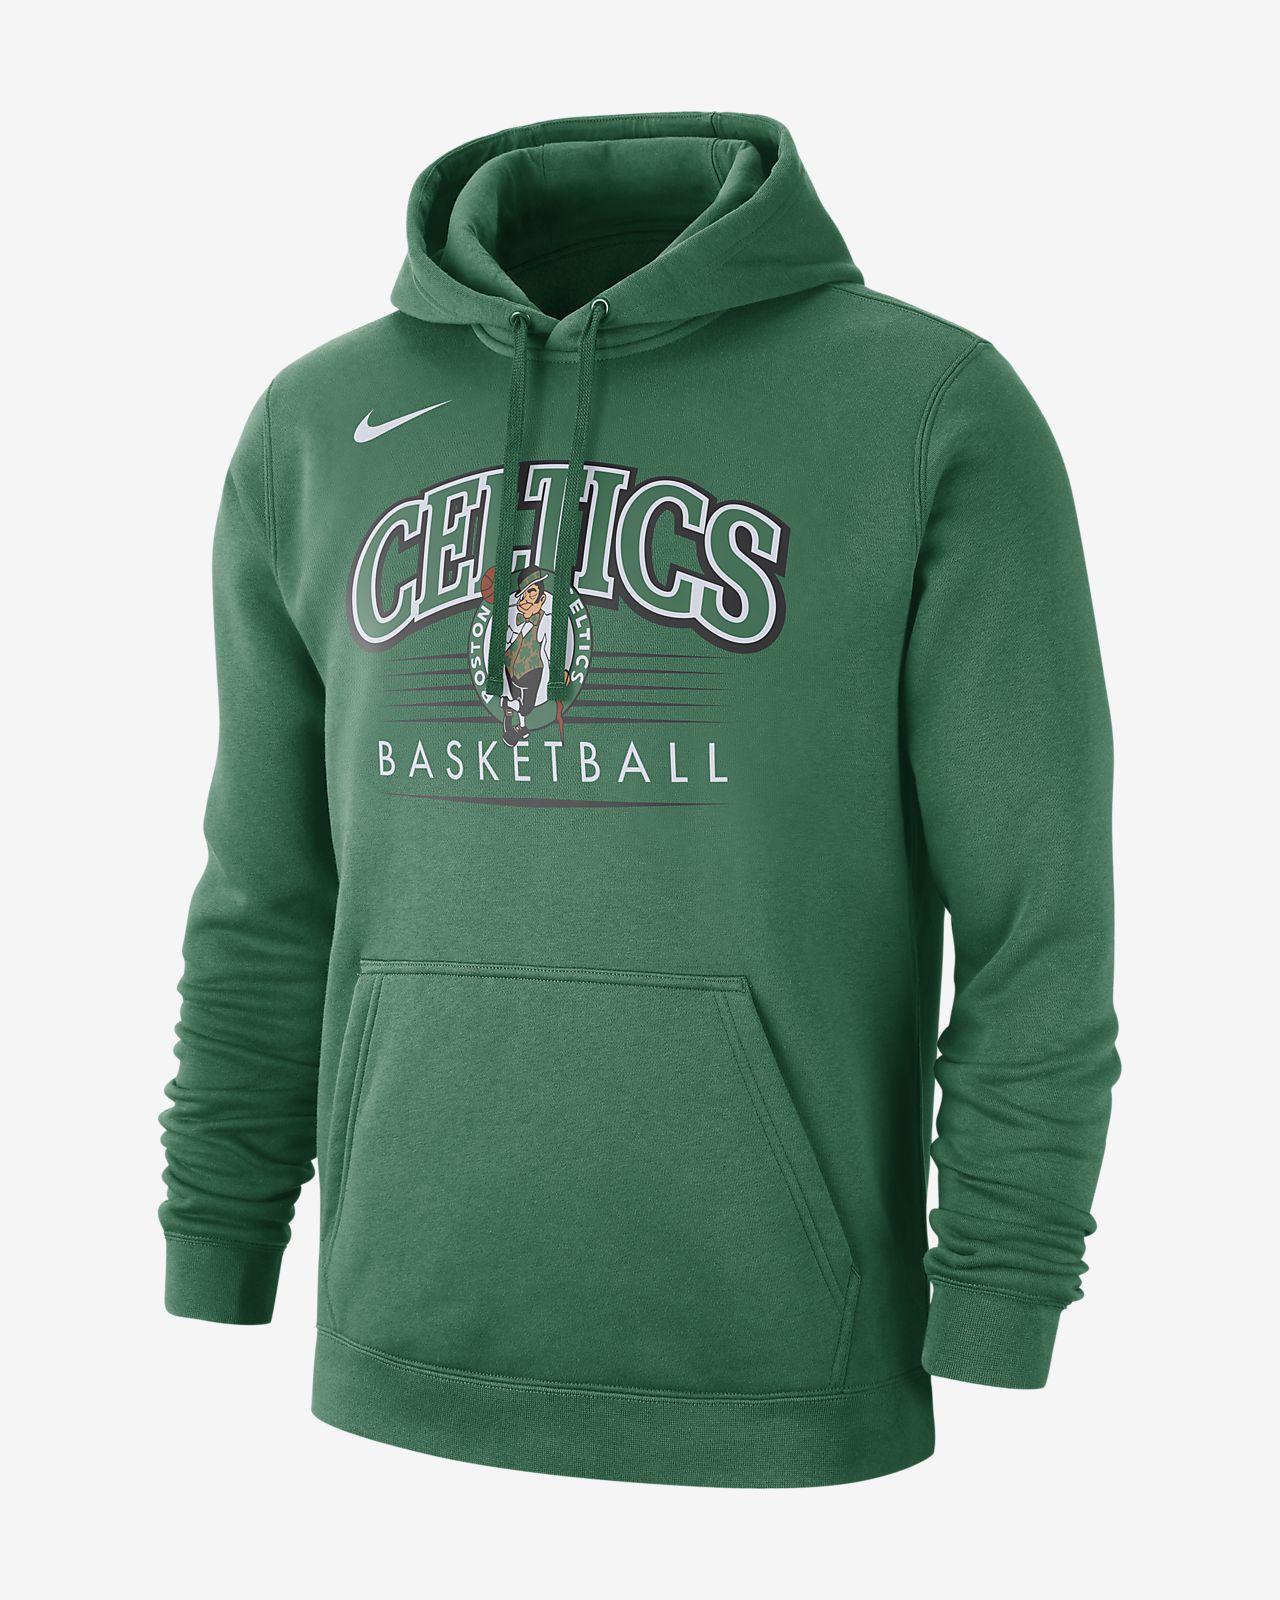 a9f9fd5672f29c Boston Celtics Nike Men s NBA Hoodie. Nike.com